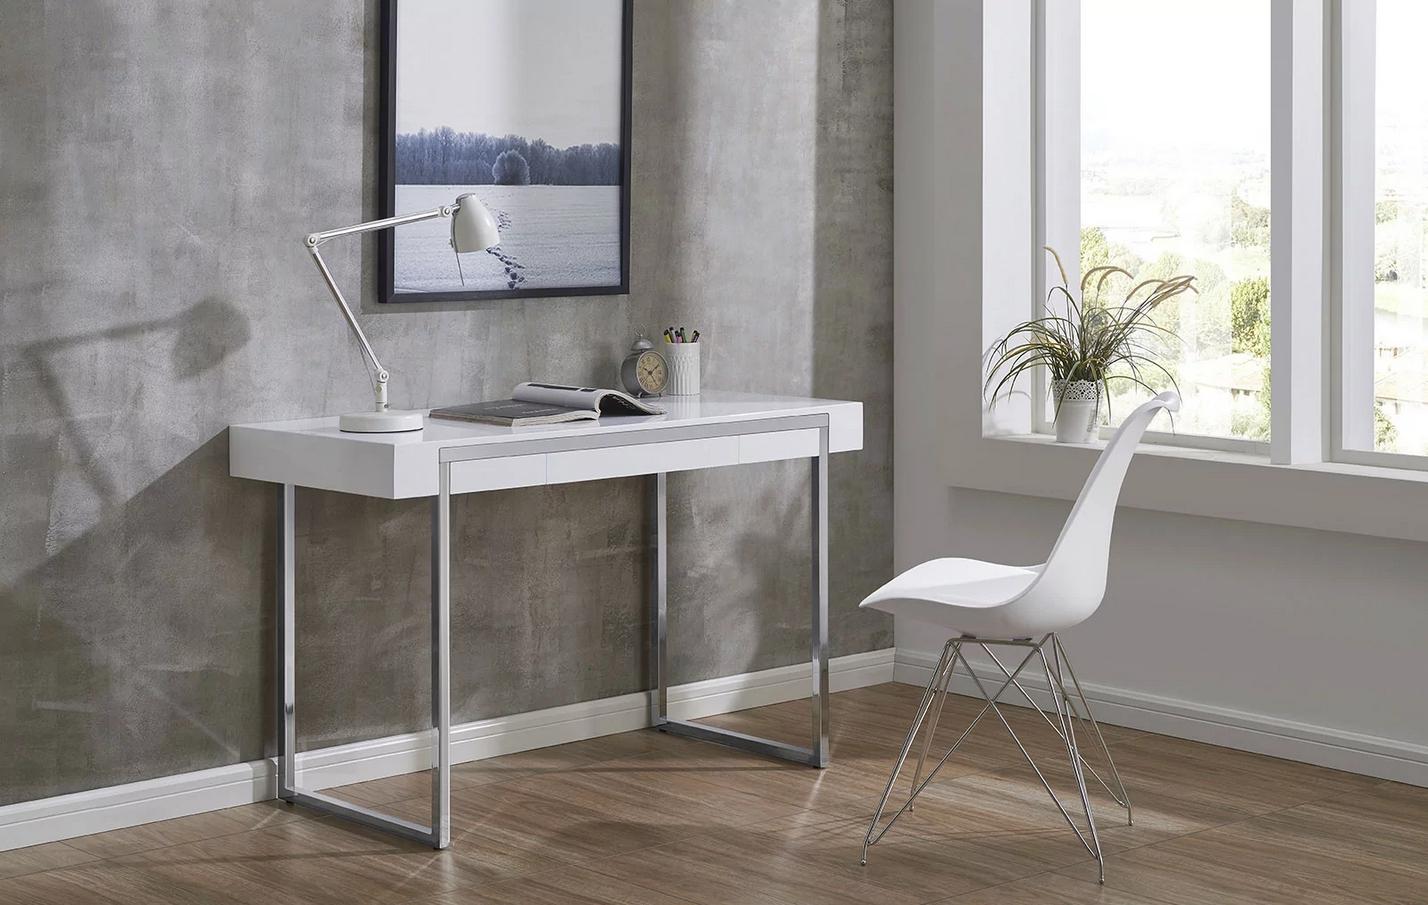 Эксклюзивная мебель бренда iModern